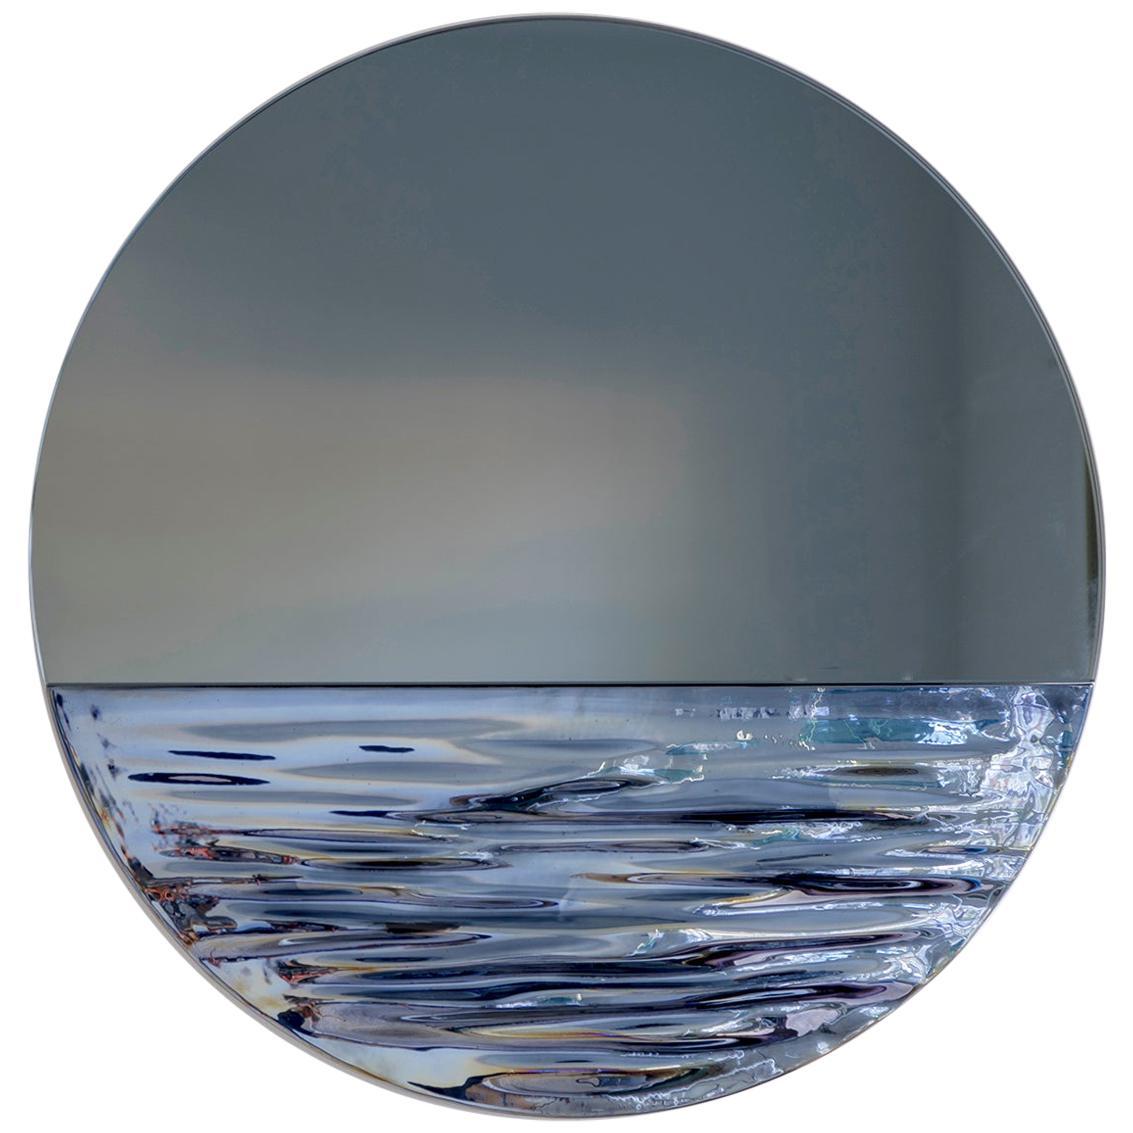 Orizon Rounded Hand Glazed Ceramic Mirror in Moonlight Blue